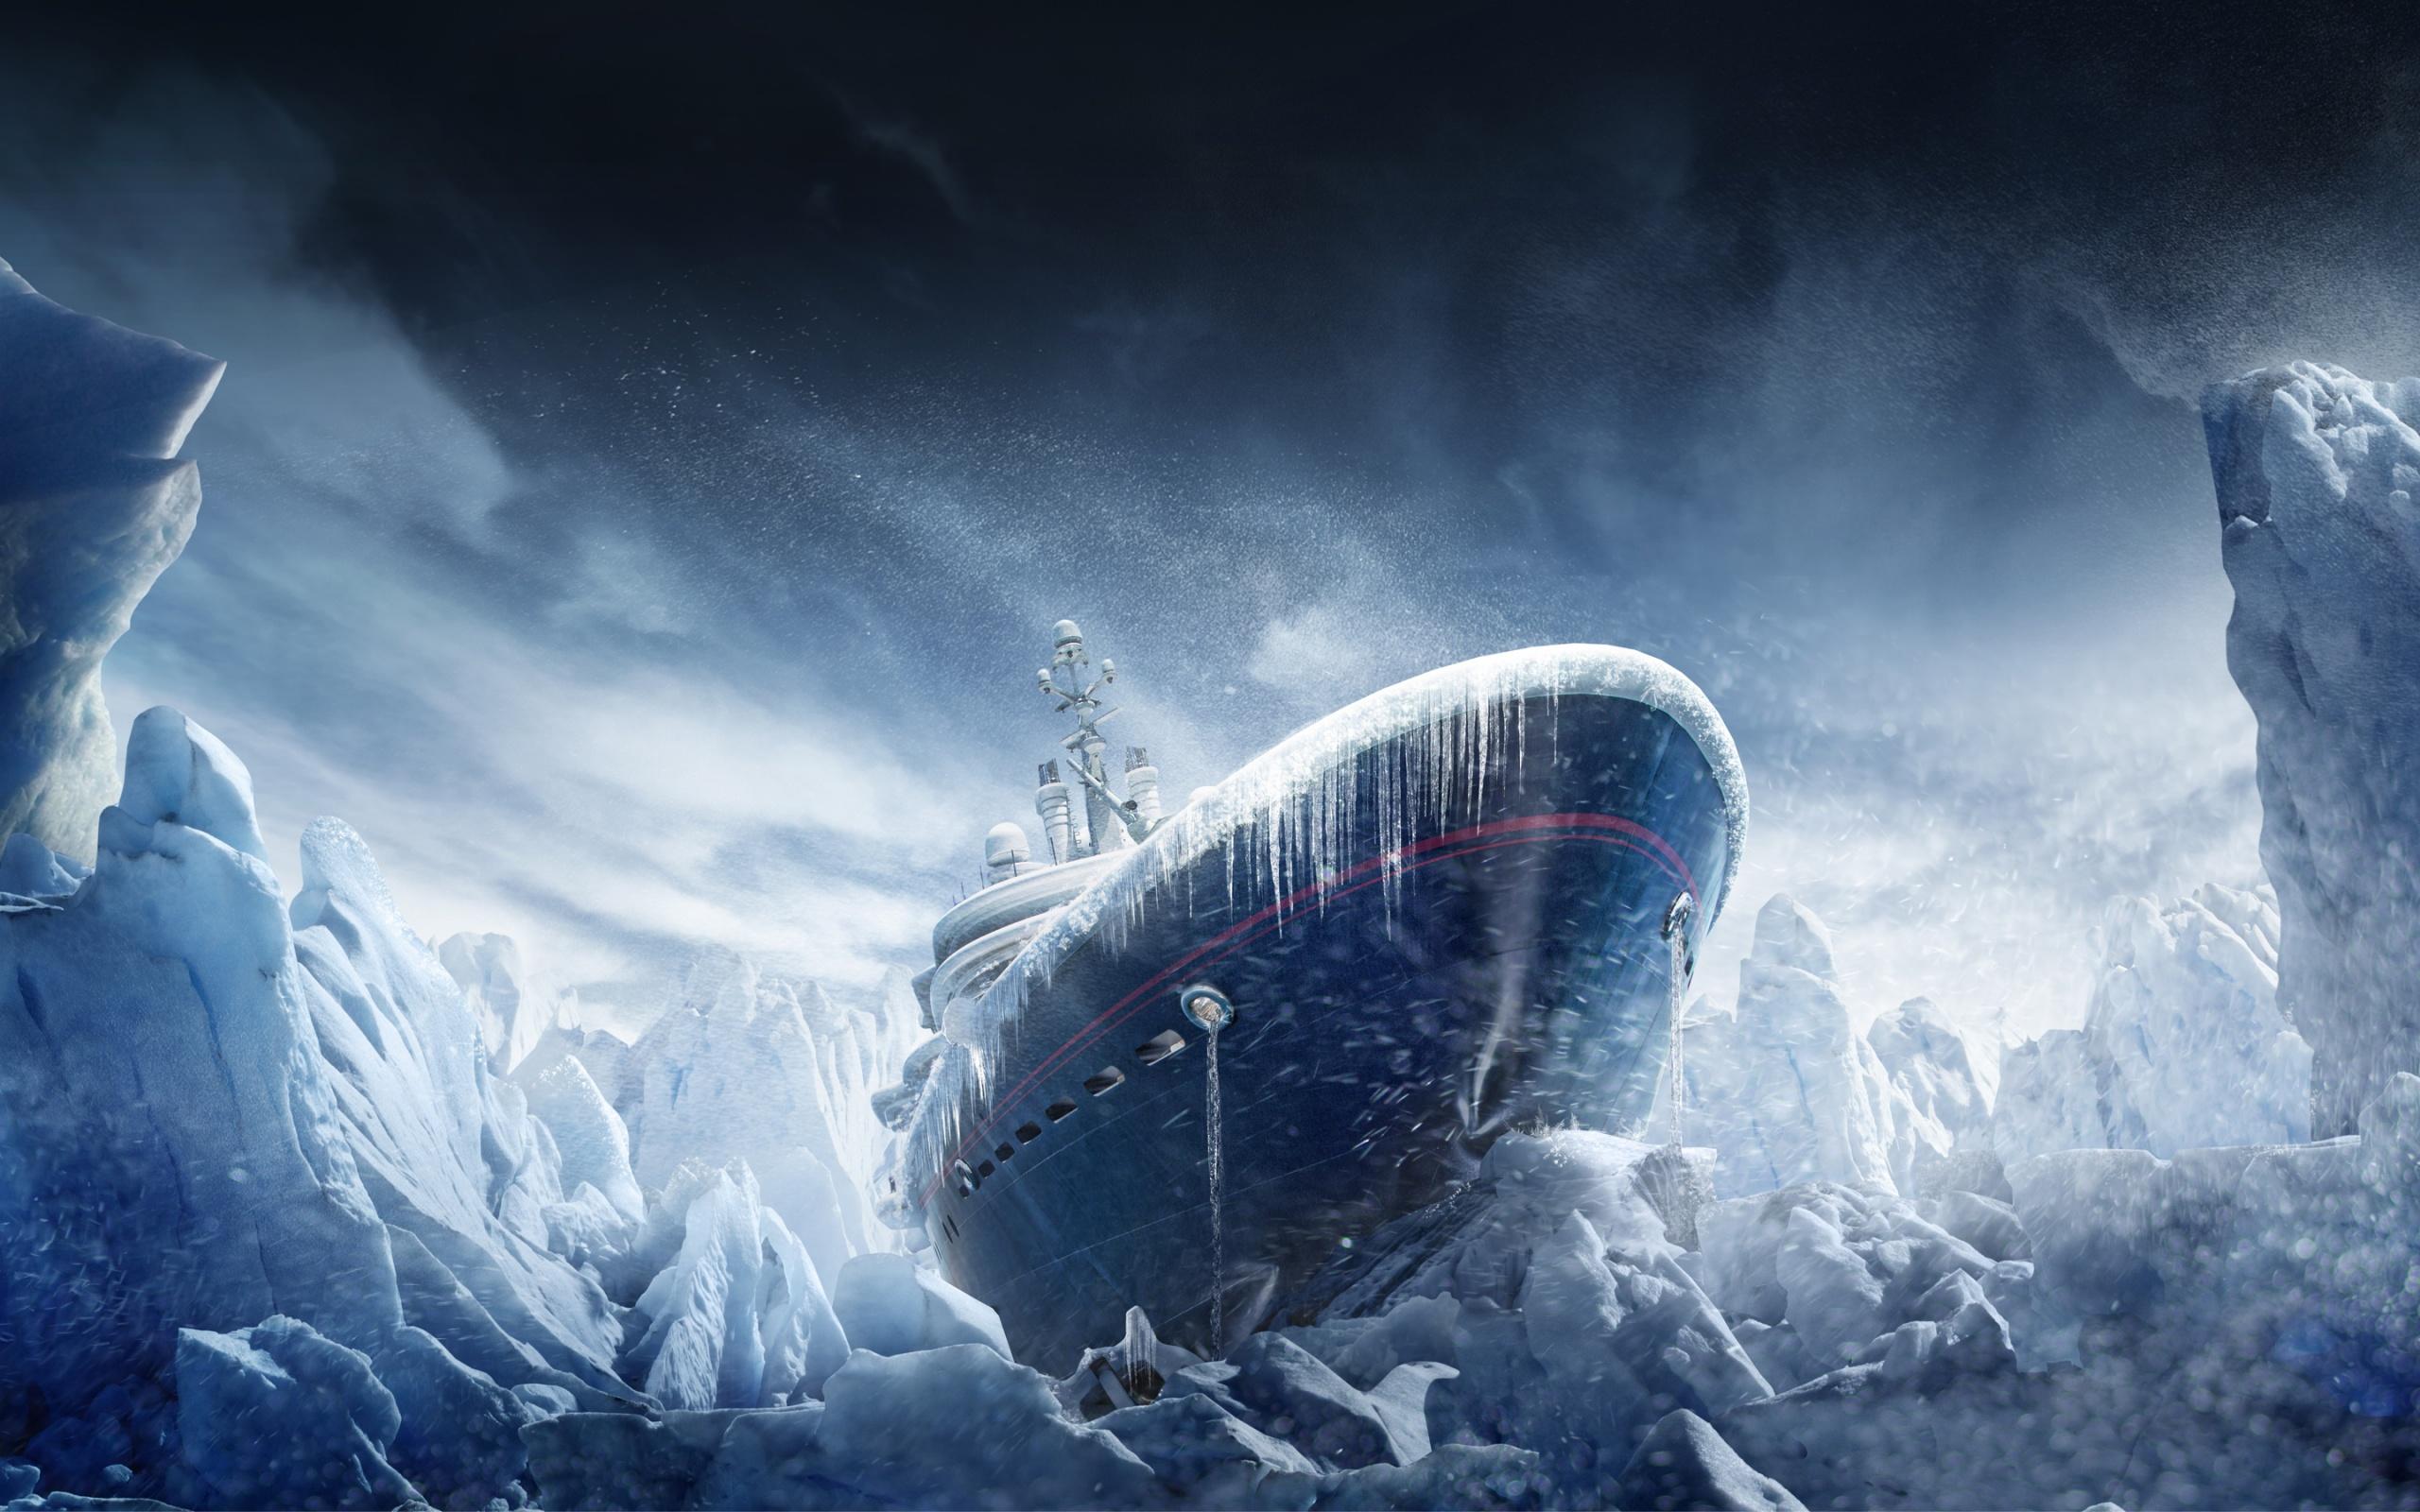 Tom Clancys Rainbow Six Siege Operation Black Ice Wallpapers in 2560x1600